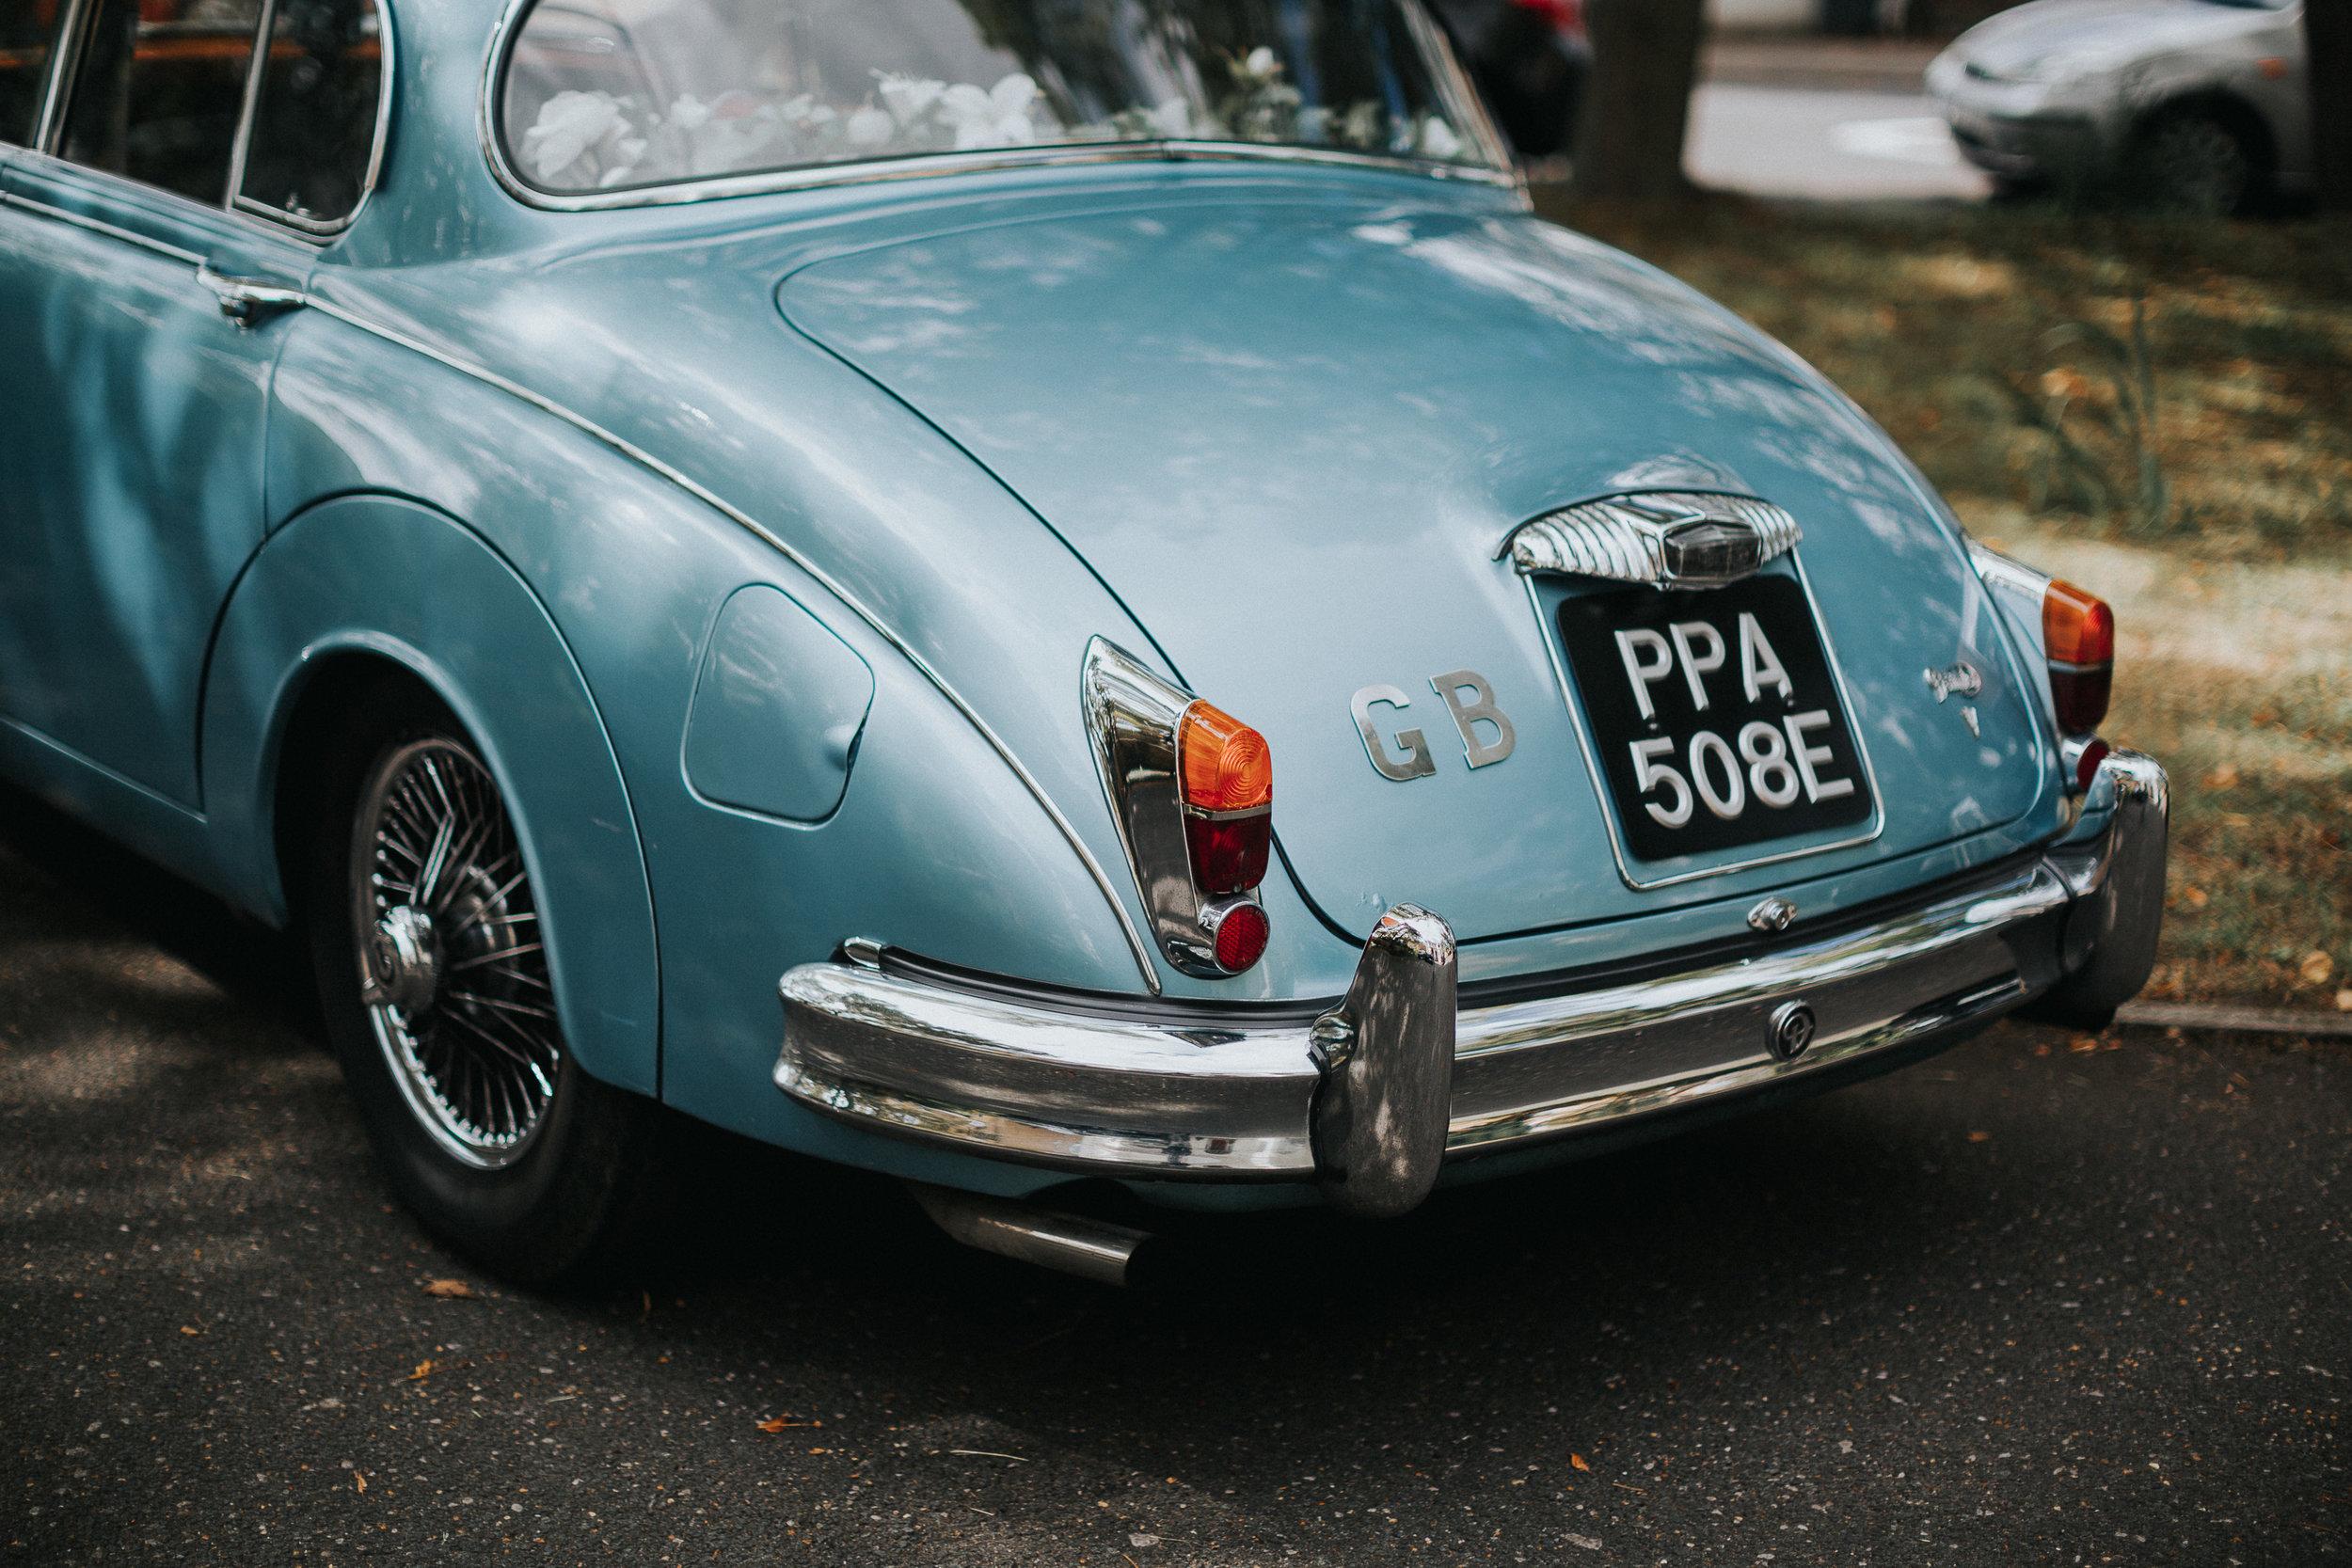 Blue Vintage Wedding Car